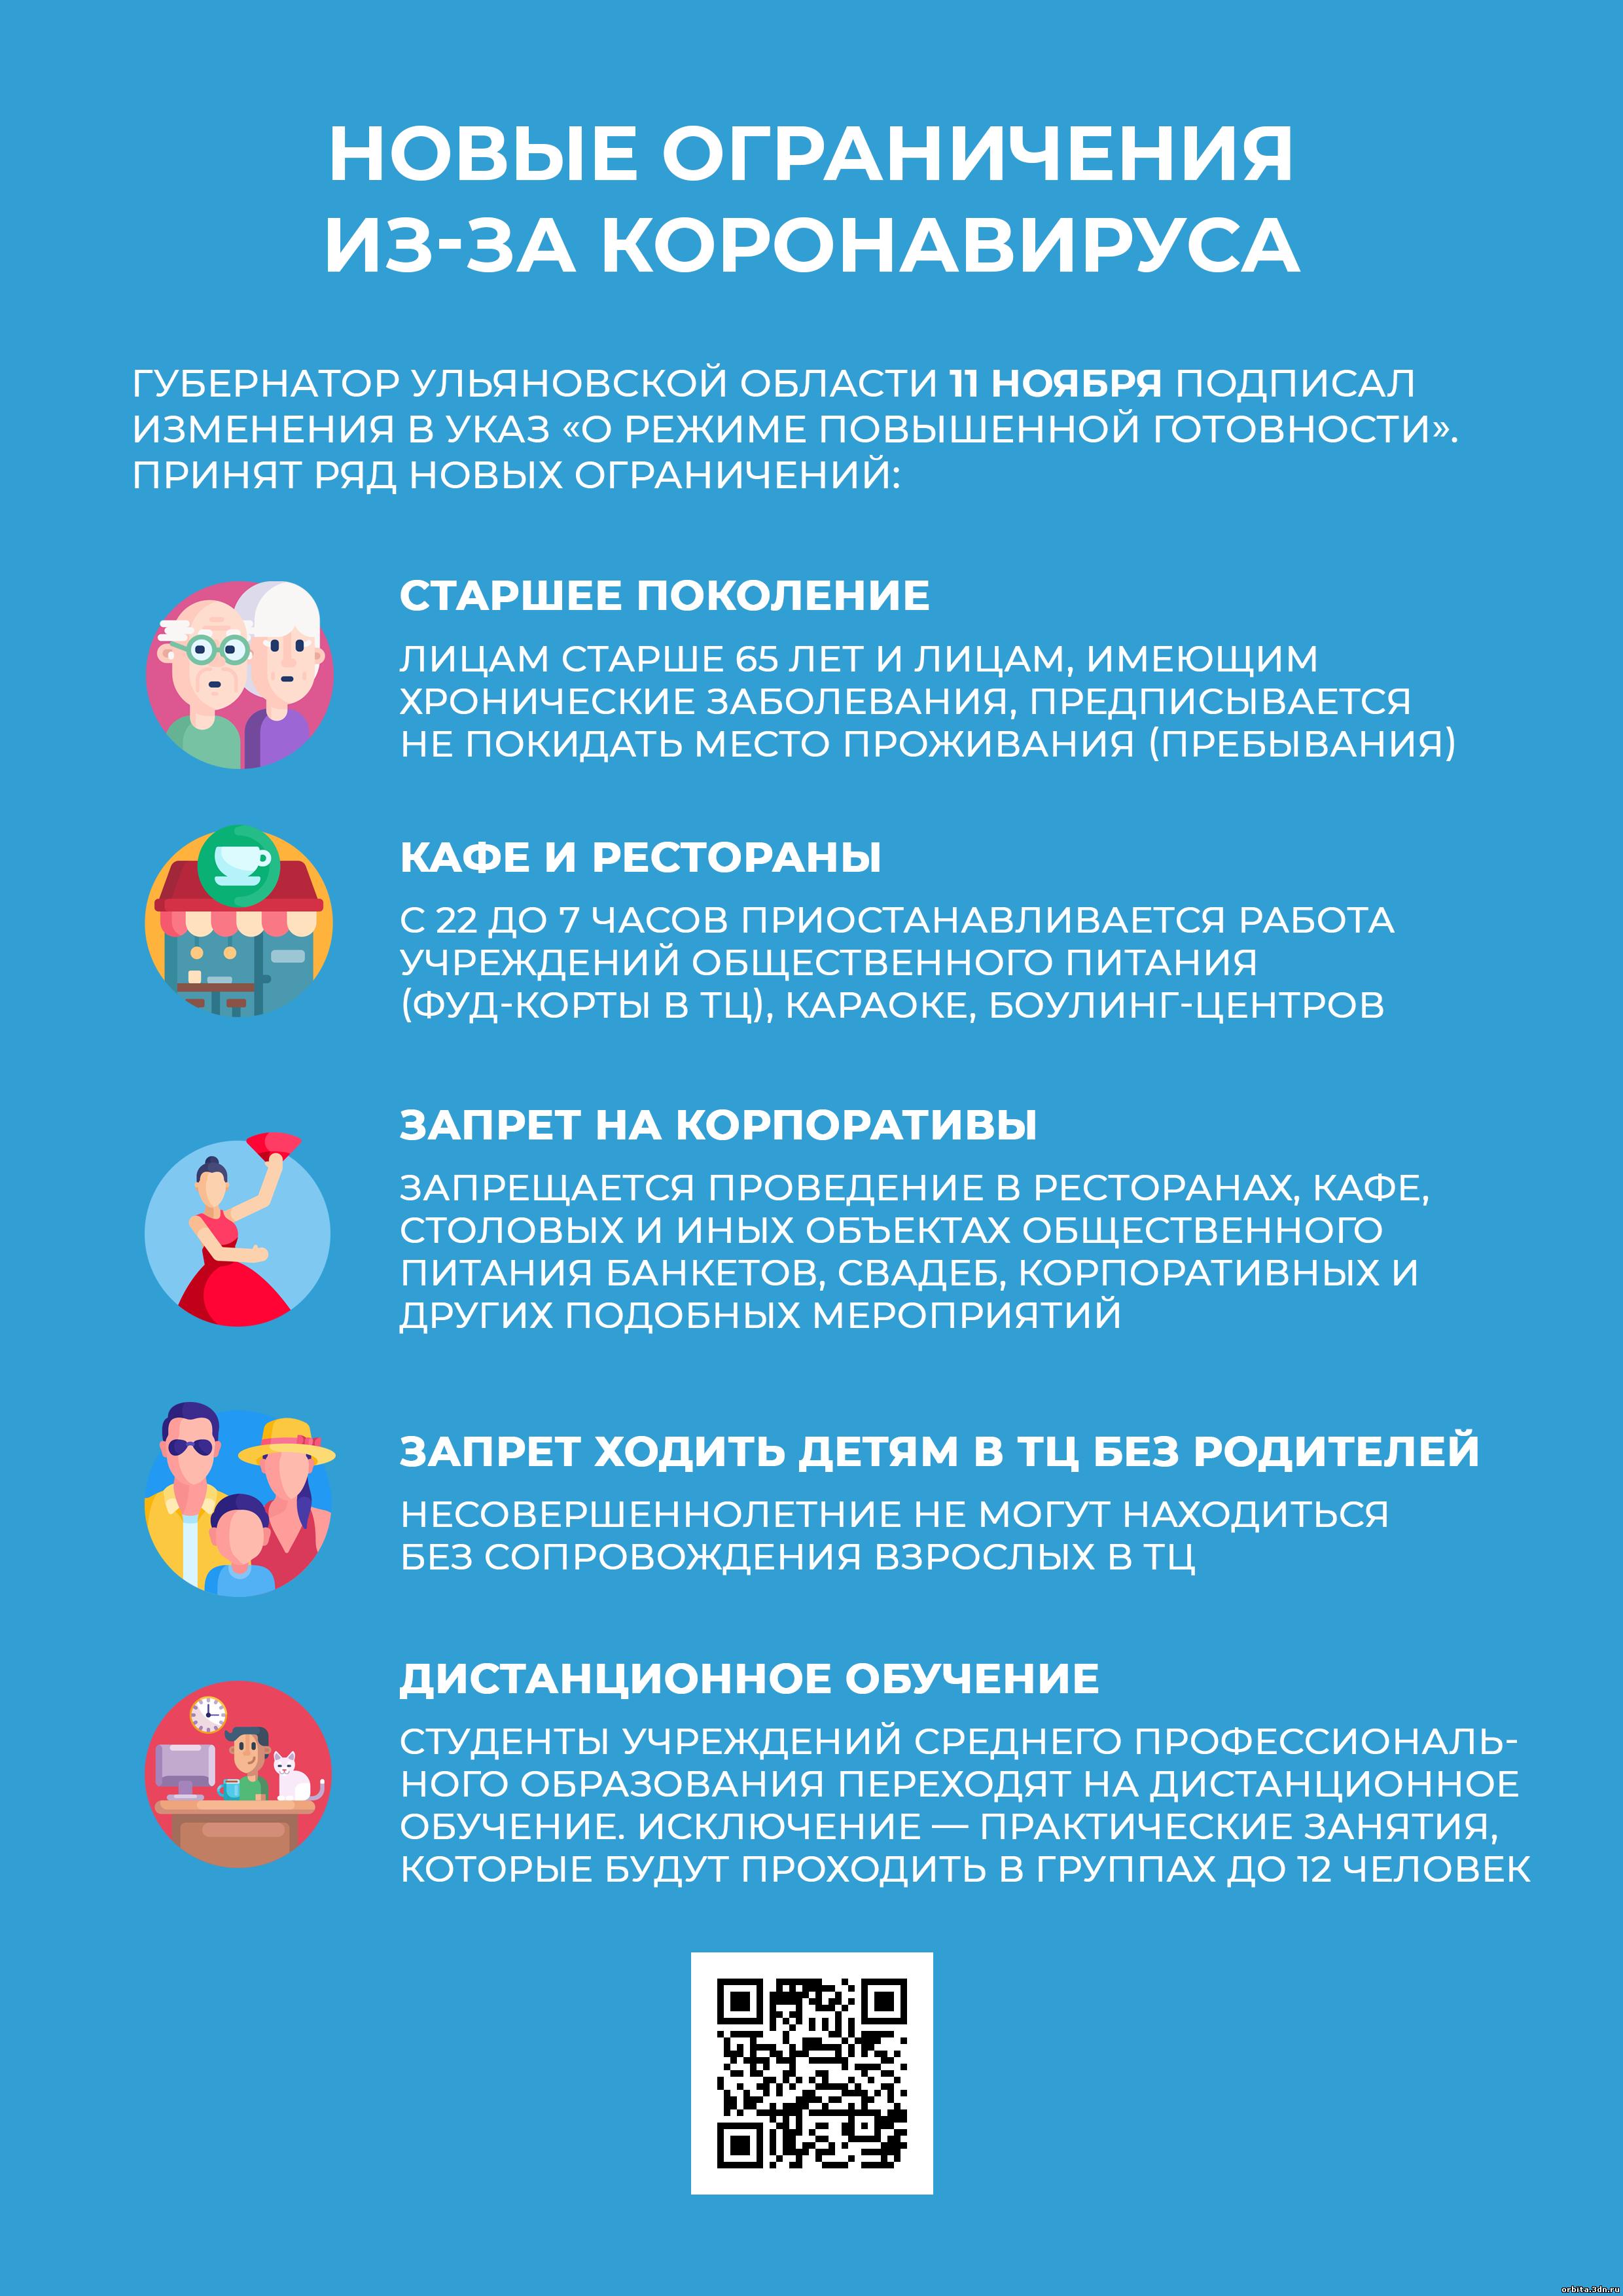 http://orbita.3dn.ru/Material/2020/novye_ogranichenija_cvetnoe.png